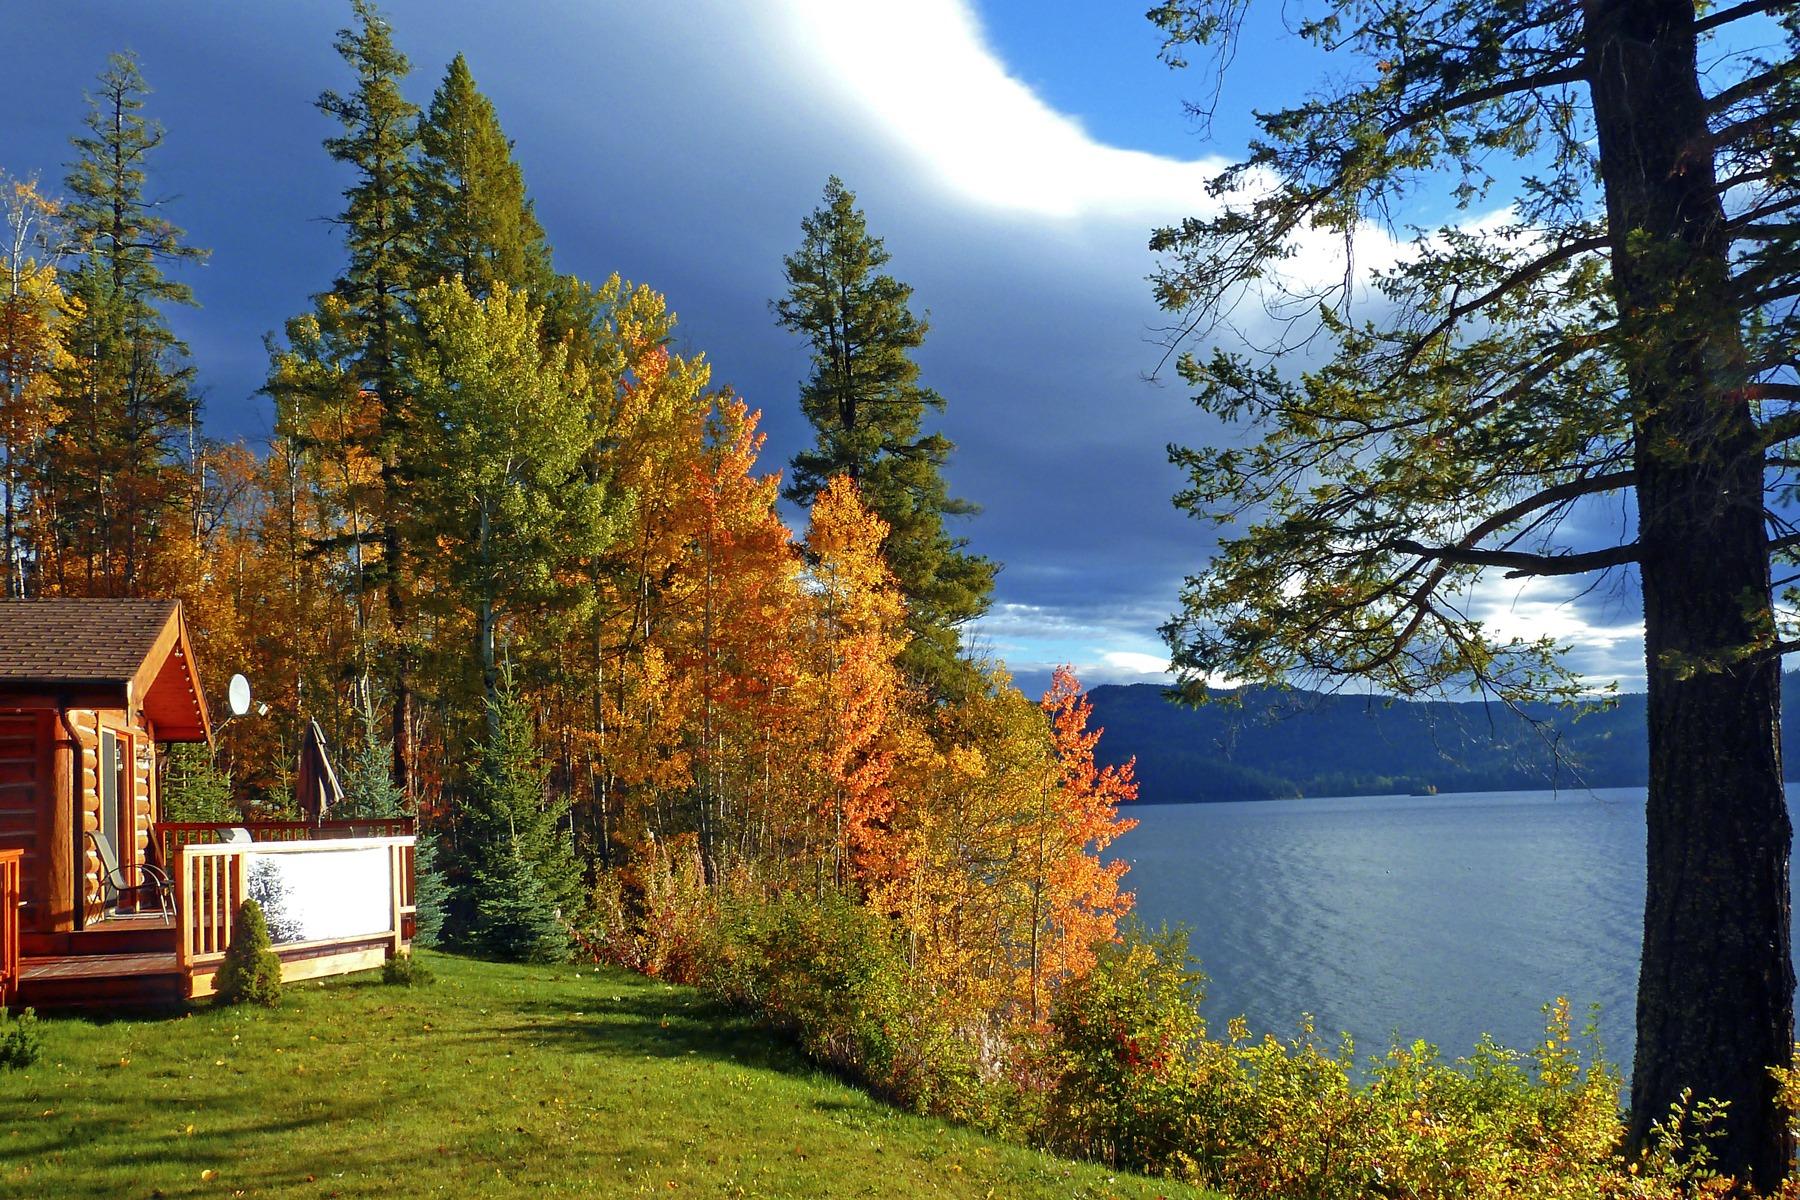 Kostenlose Foto Landschaft Baum Natur Wiese Blatt Fallen